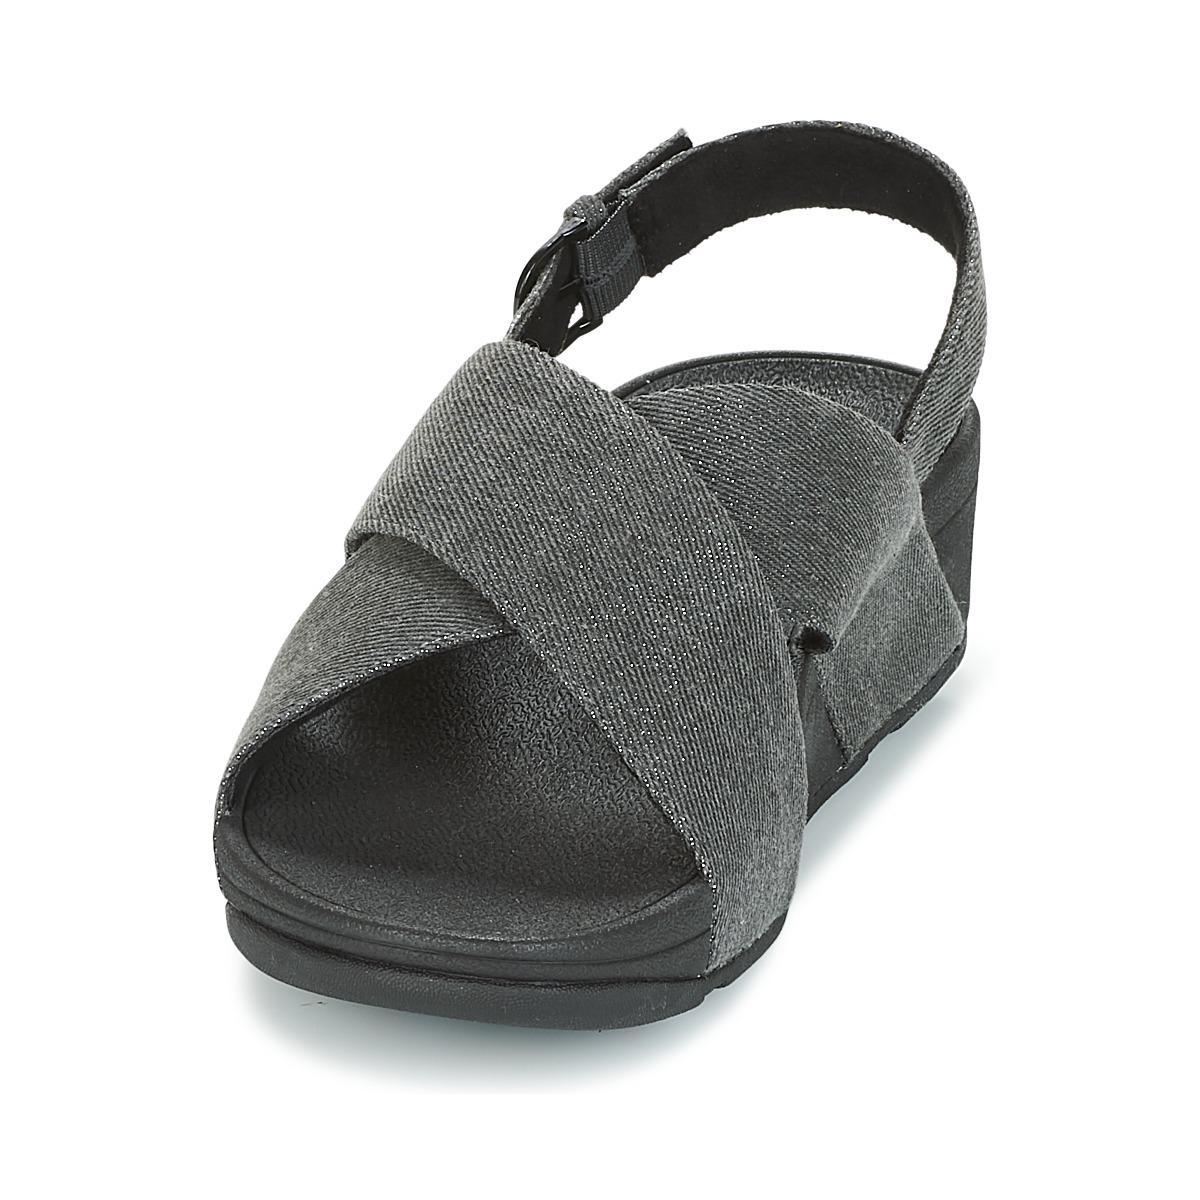 5c90480c1 Fitflop - Lulu Cross Back-strap Sandals Women s Sandals In Black - Lyst.  View fullscreen